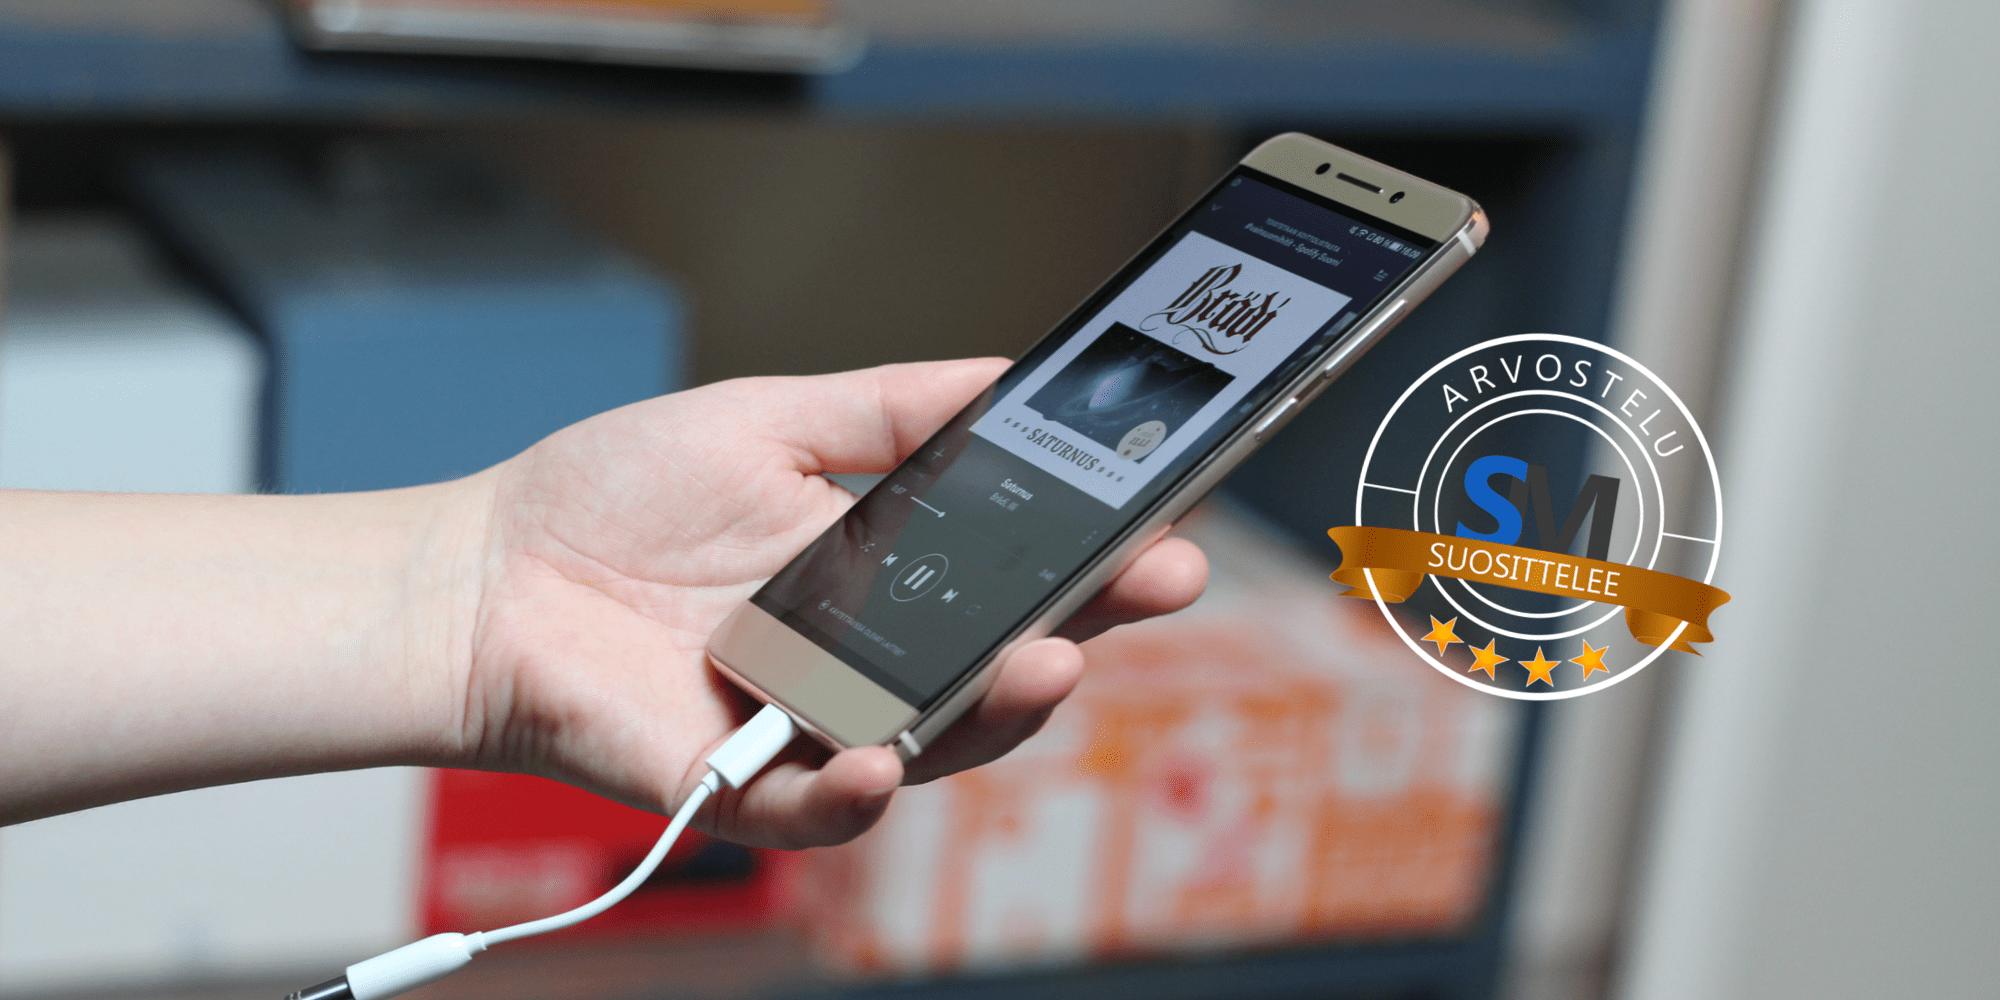 Apple iPhone 6s skladem IPhone 6S - Velk slevy na model 6S - Kup hned Iphone 6S - levn